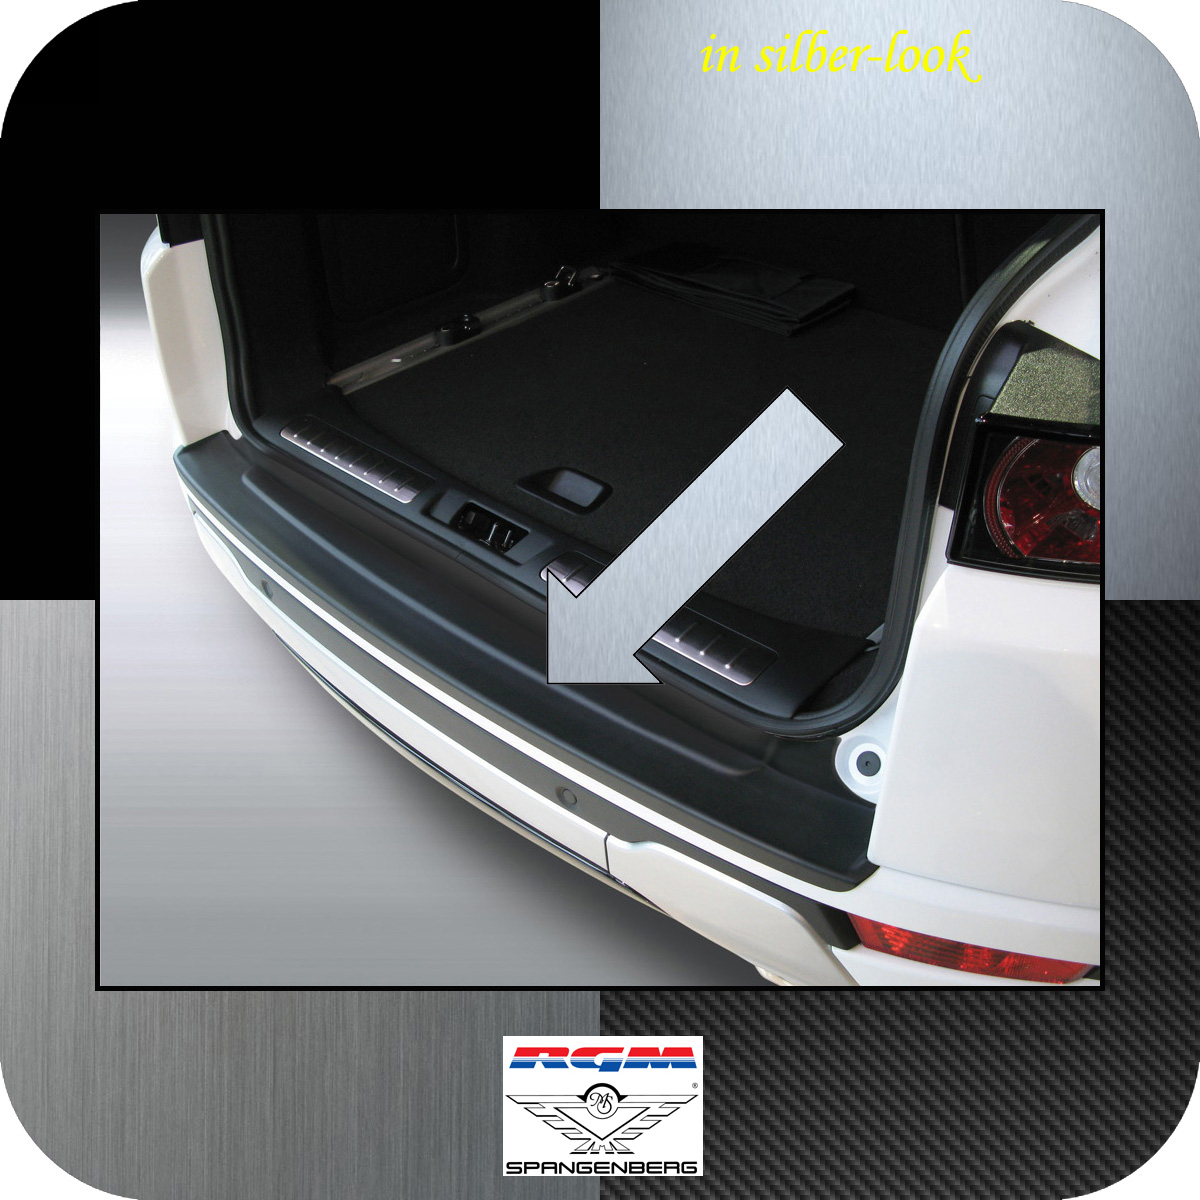 Ladekantenschutz Silber-Look Land Rover Range Rover Evoque 3-Türer 2011- 3506583